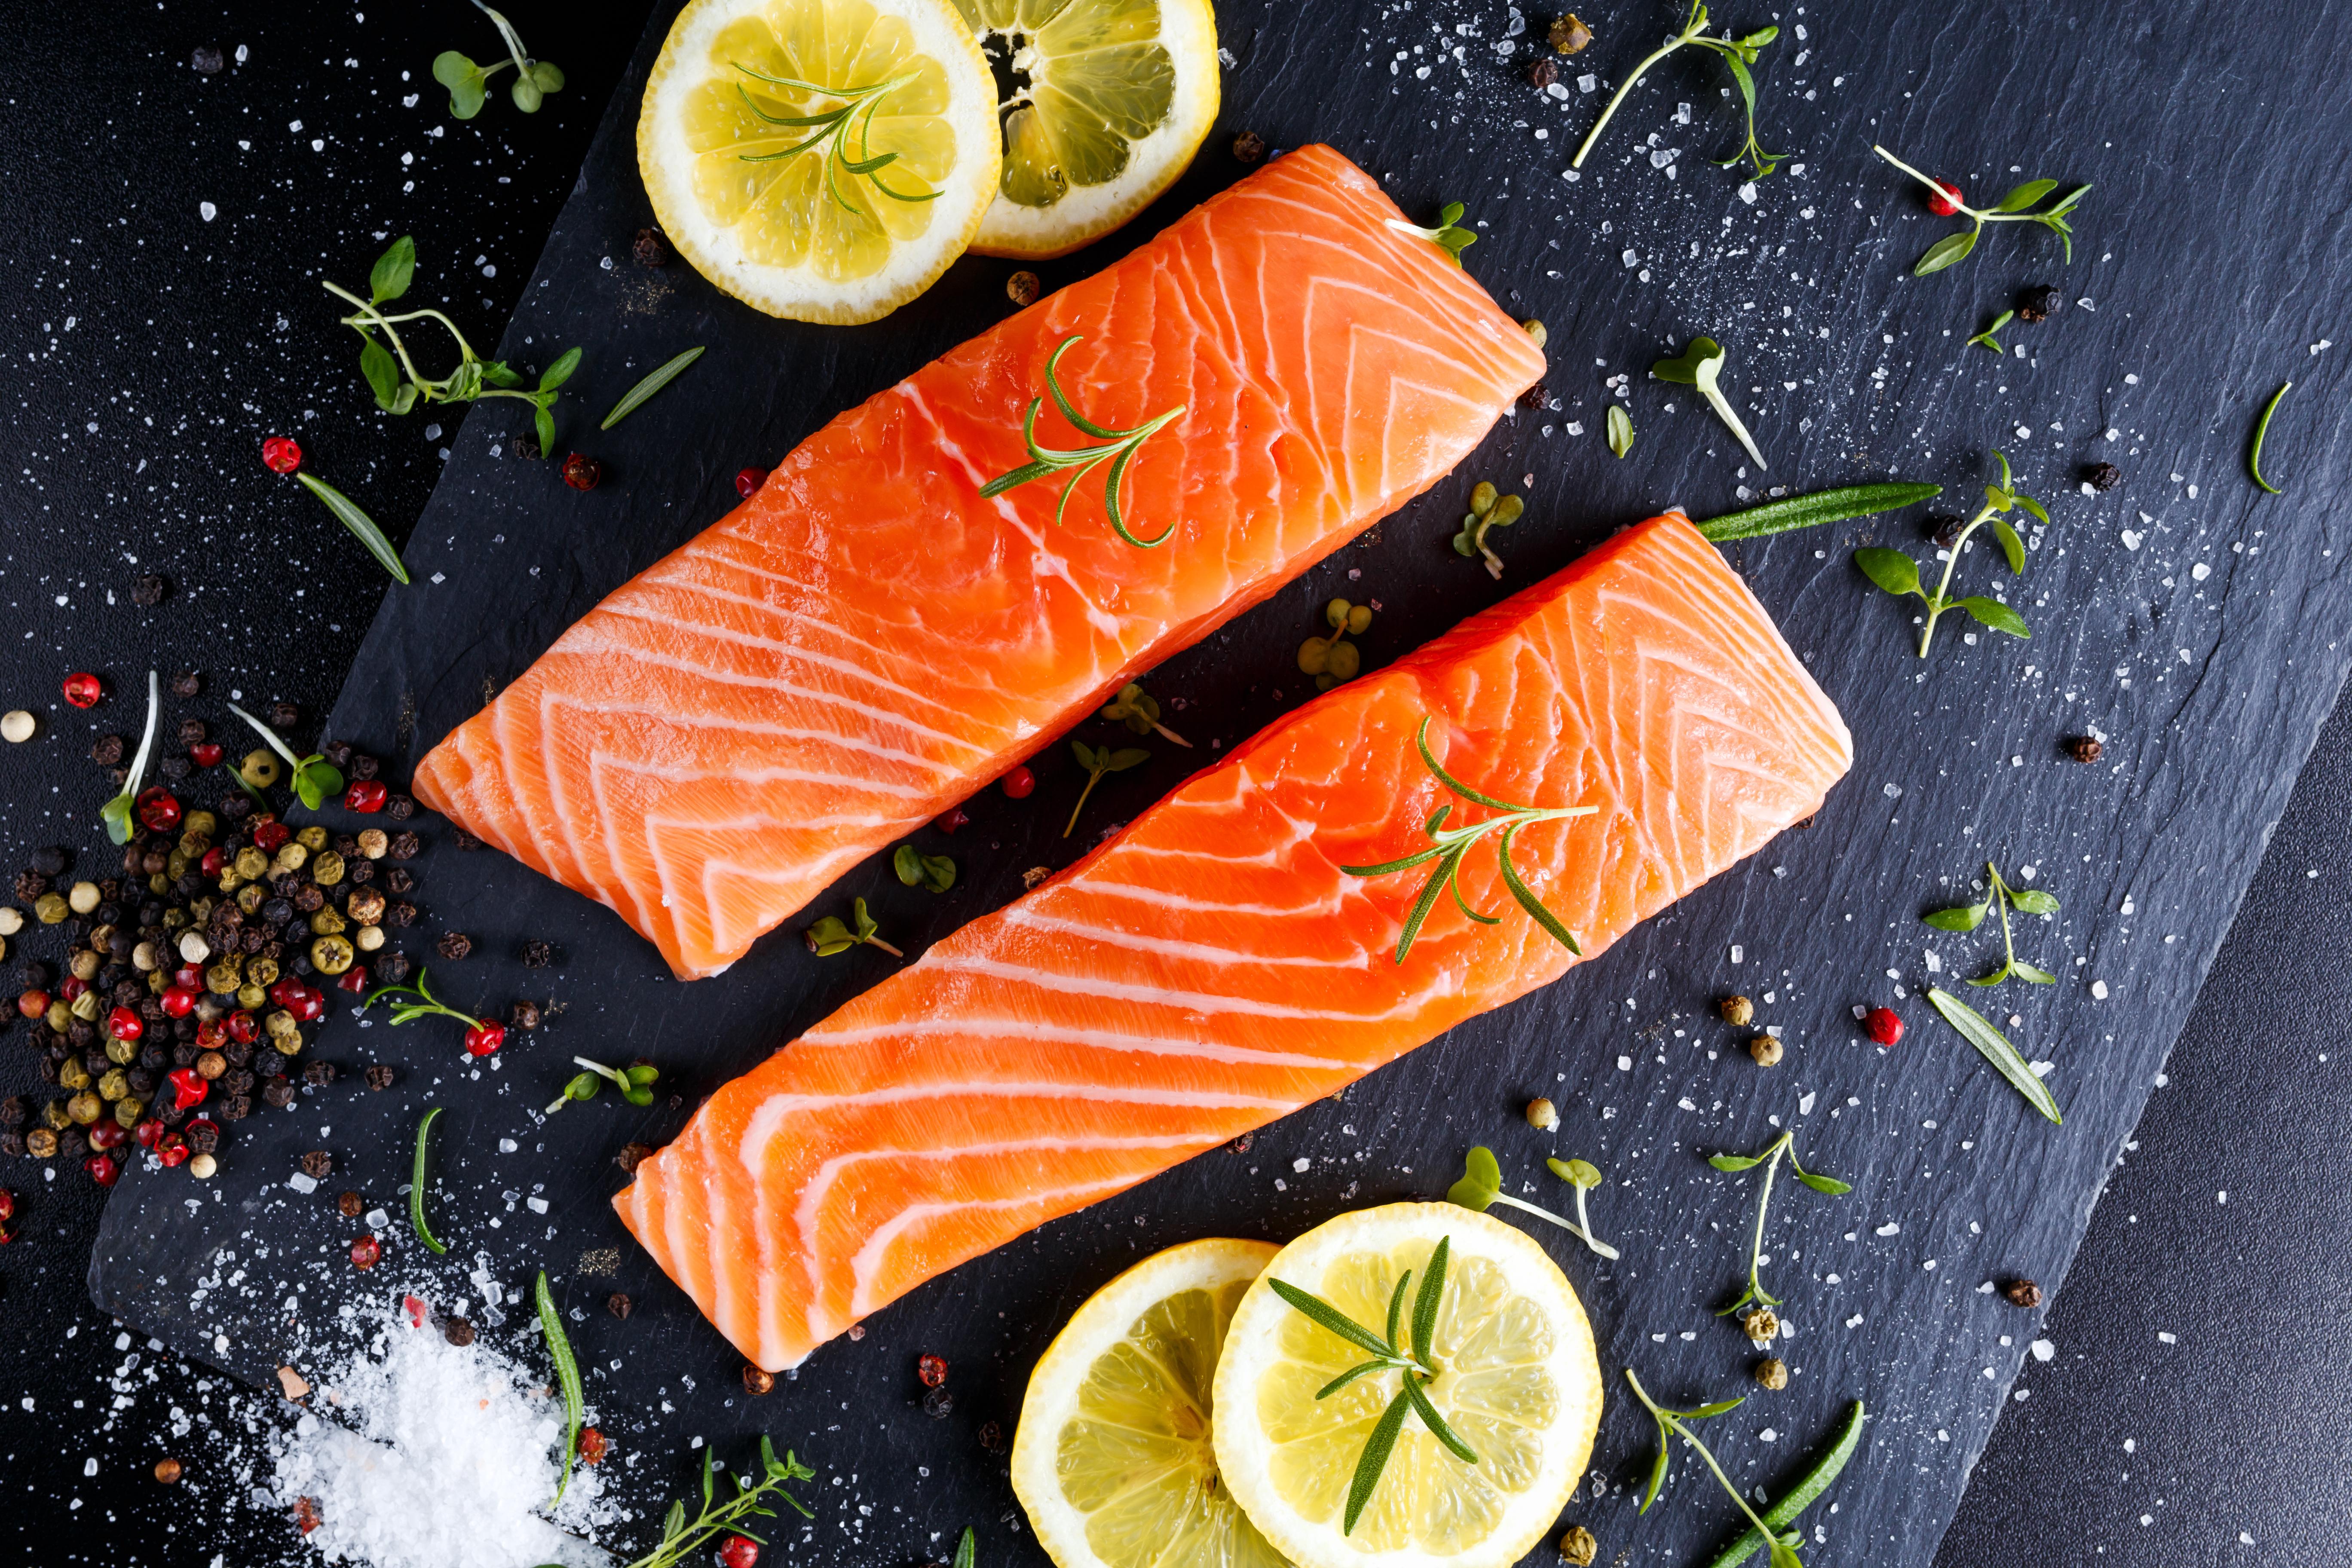 greensbury salmon